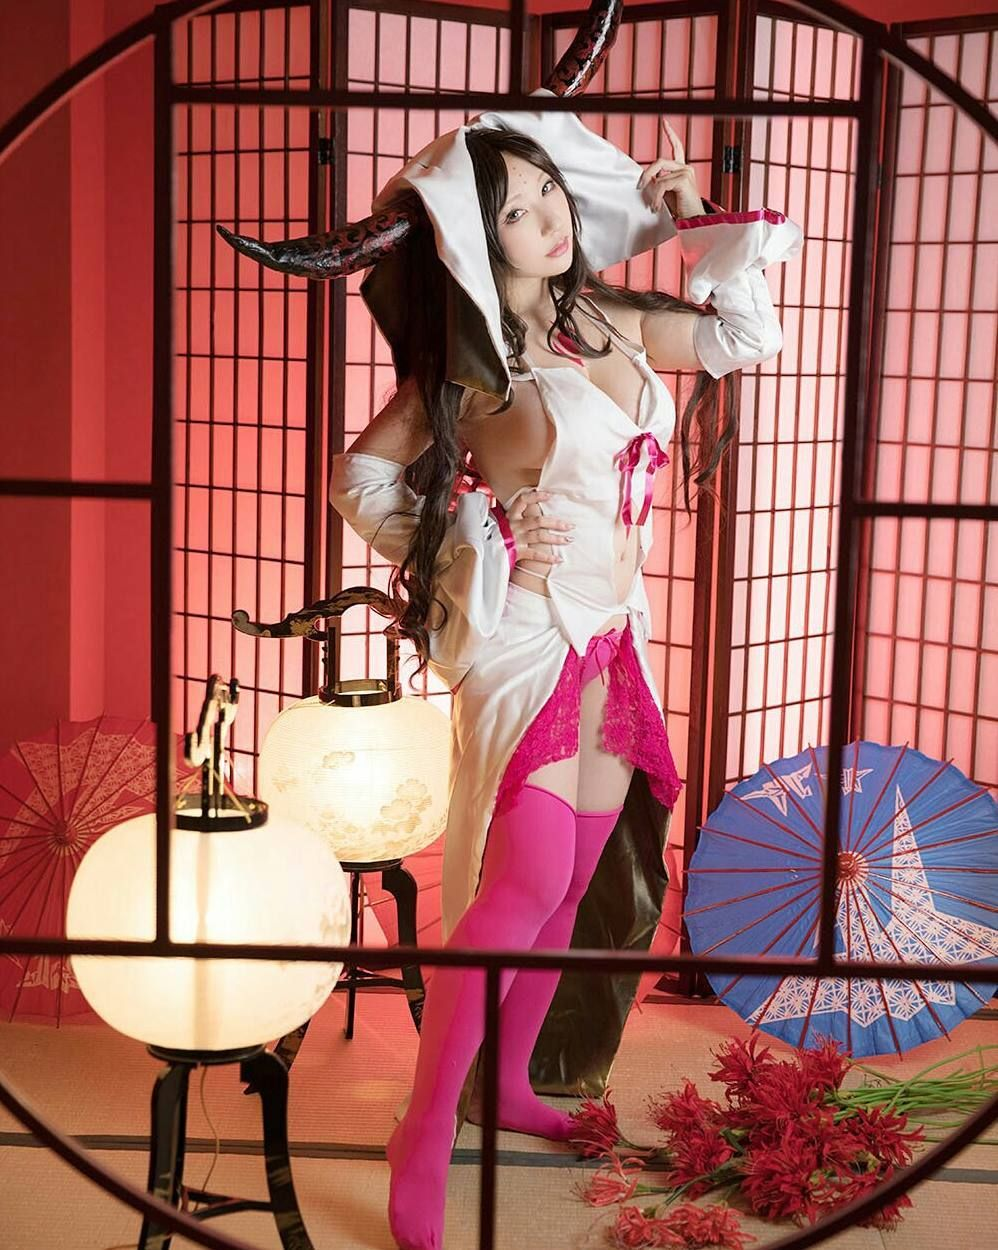 bbc43ec363  fategrandorder  fgo  servant  fateseries  photoshoot  indoor  sexy   sexycosplay  cleavage  oppai  boobs  thigh  horn  stockings  sakuayaka   sakucosplayer ...